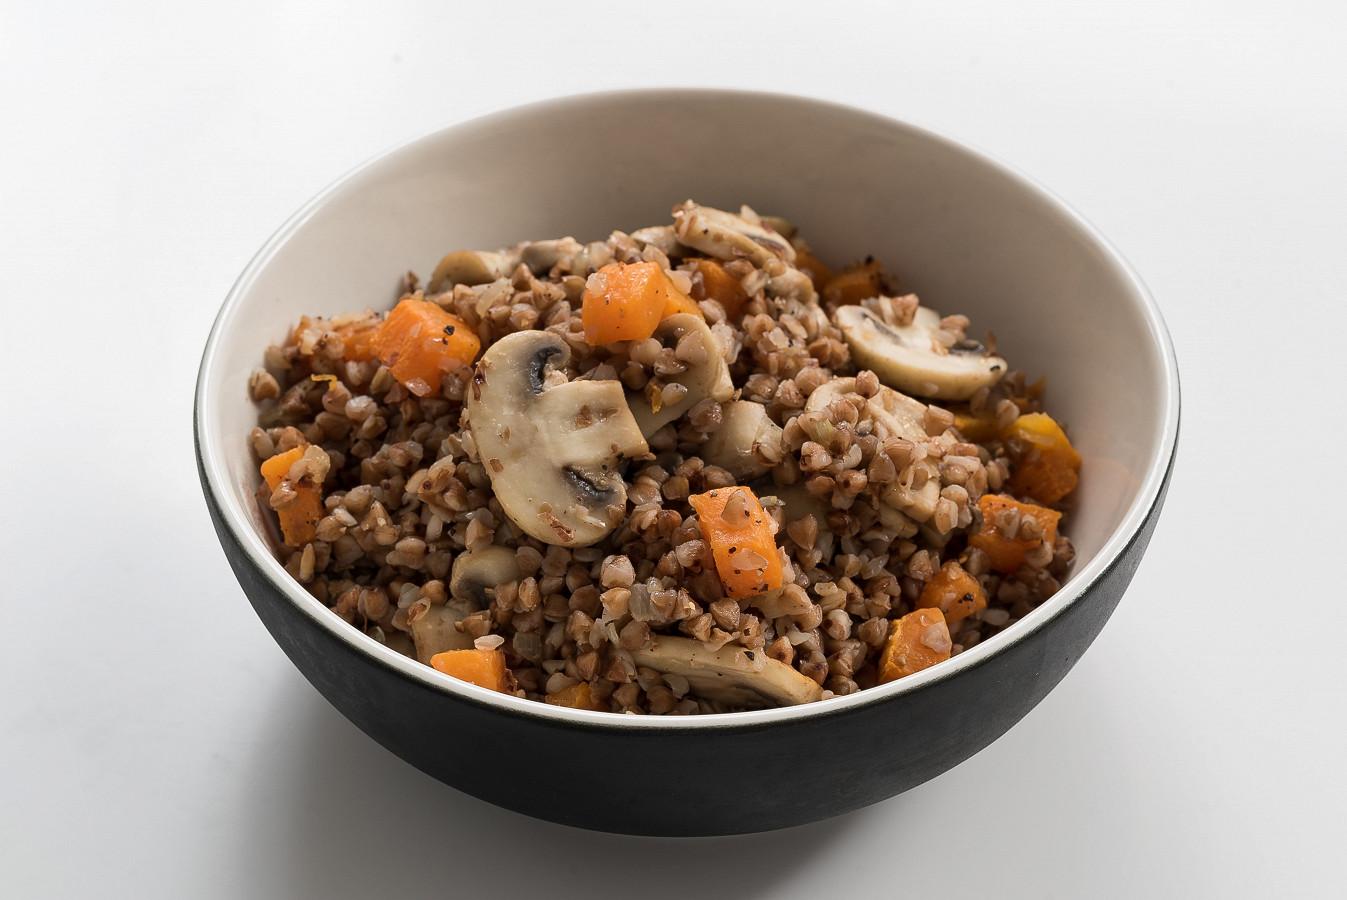 Buckwheat with mushrooms and baked pumpkin